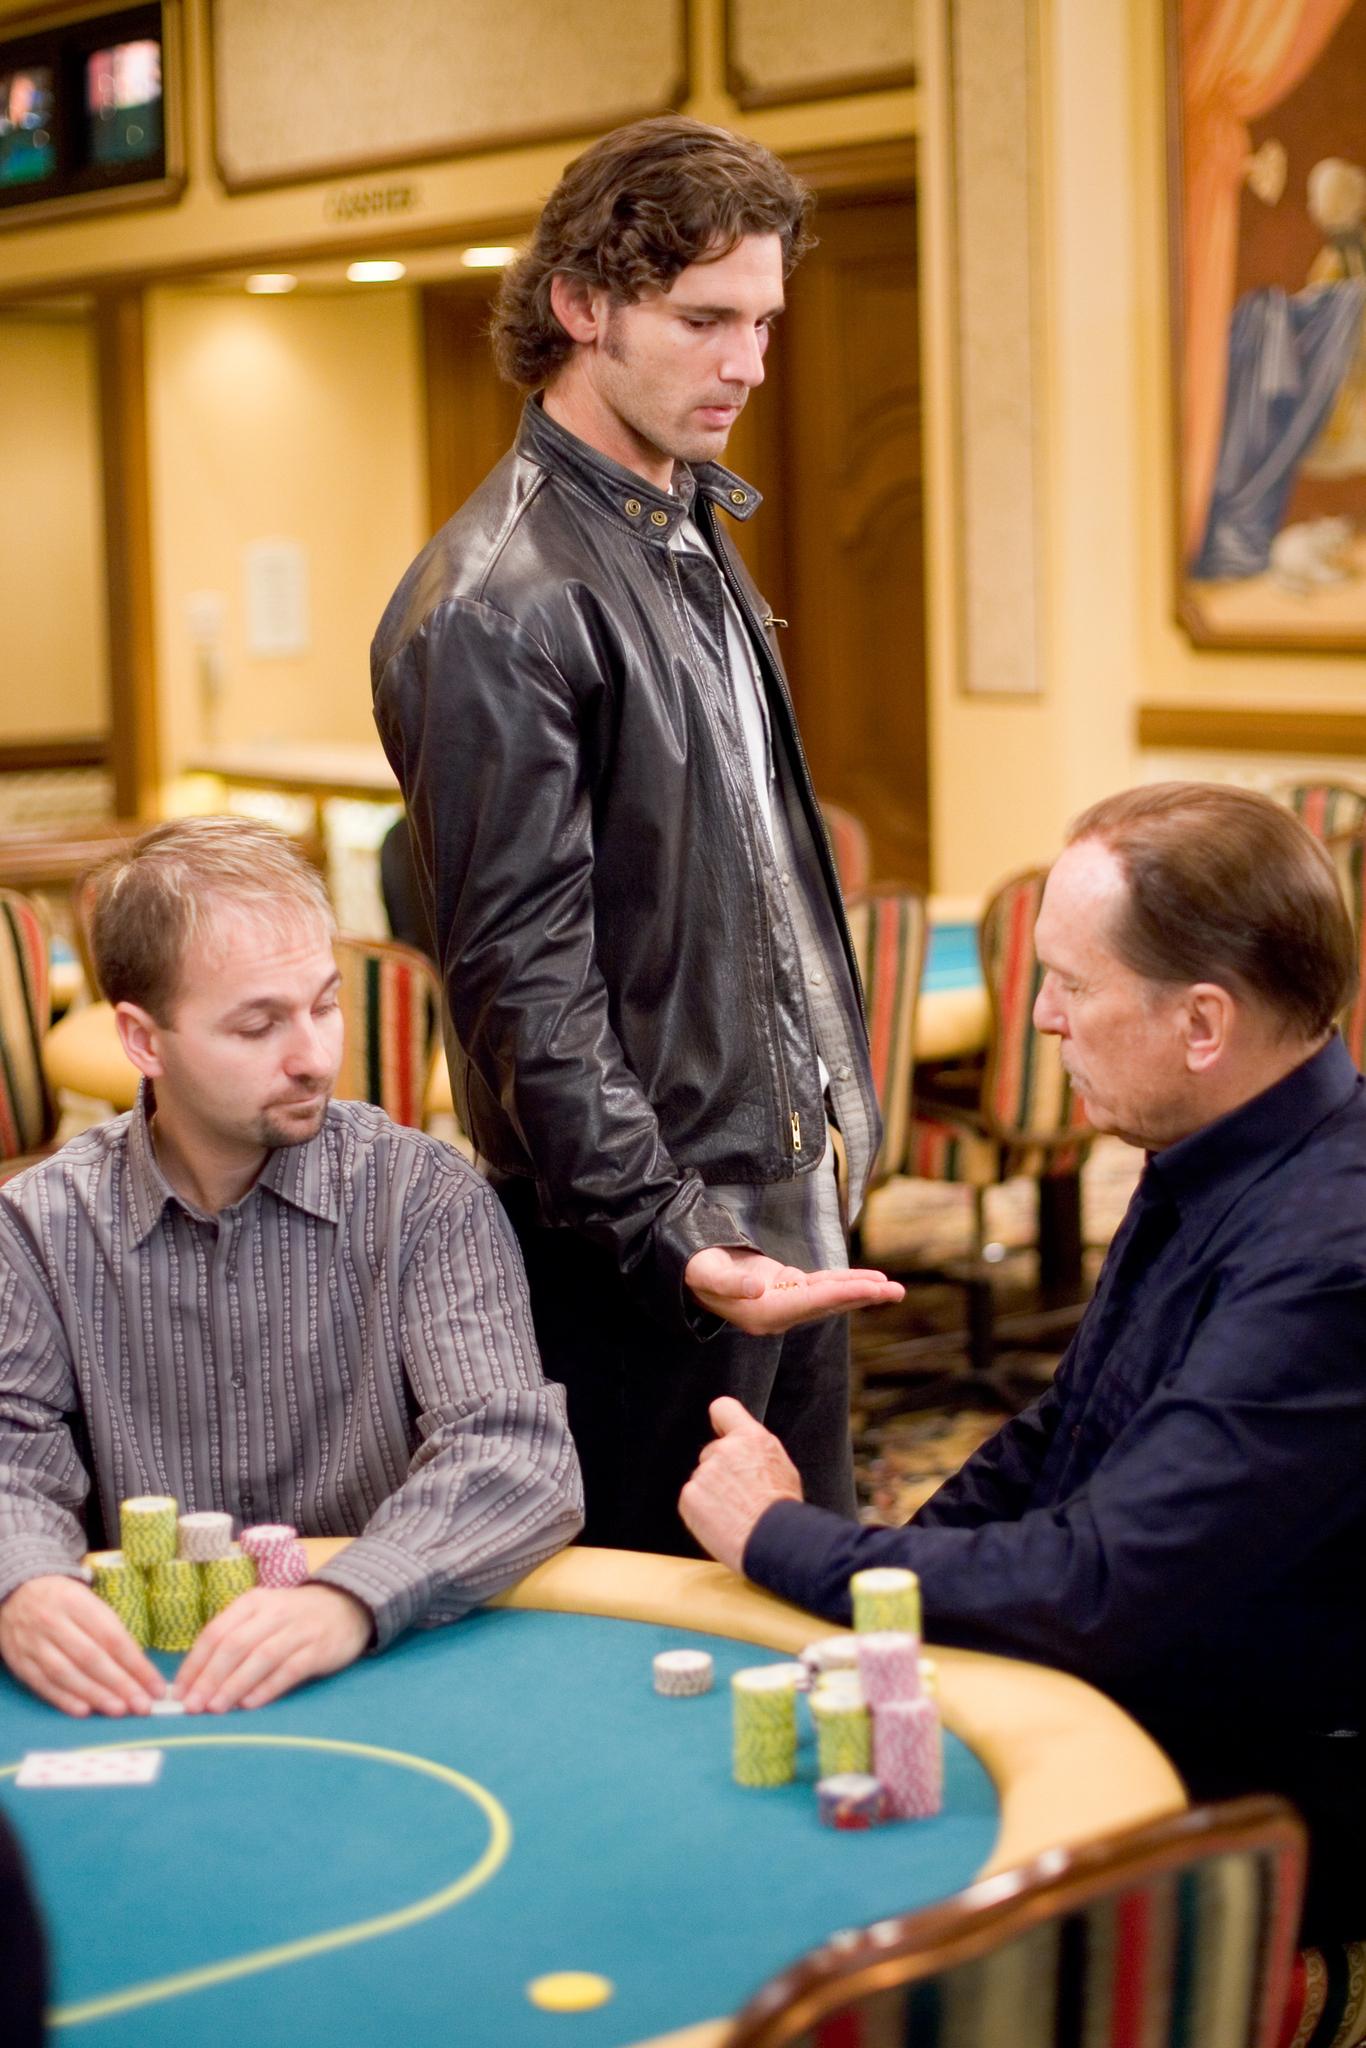 Robert Duvall, Eric Bana, and Daniel Negreanu in Lucky You (2007)